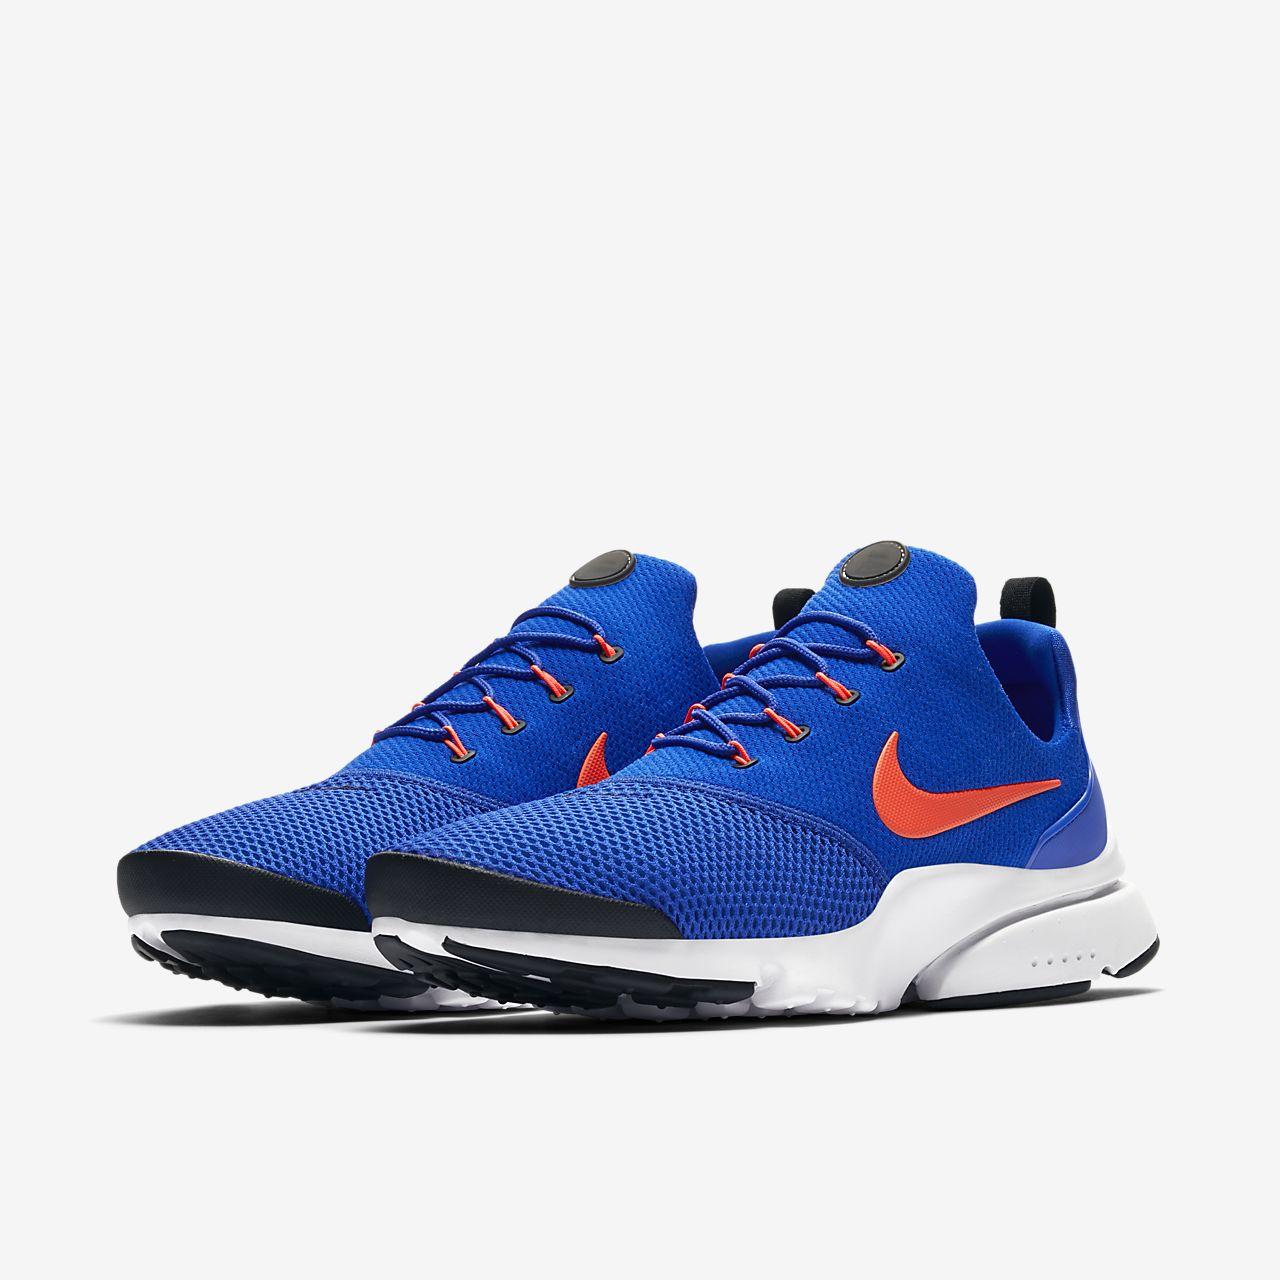 e479f93bbc50 Nike Presto Fly Men s Shoe. Nike.com CA